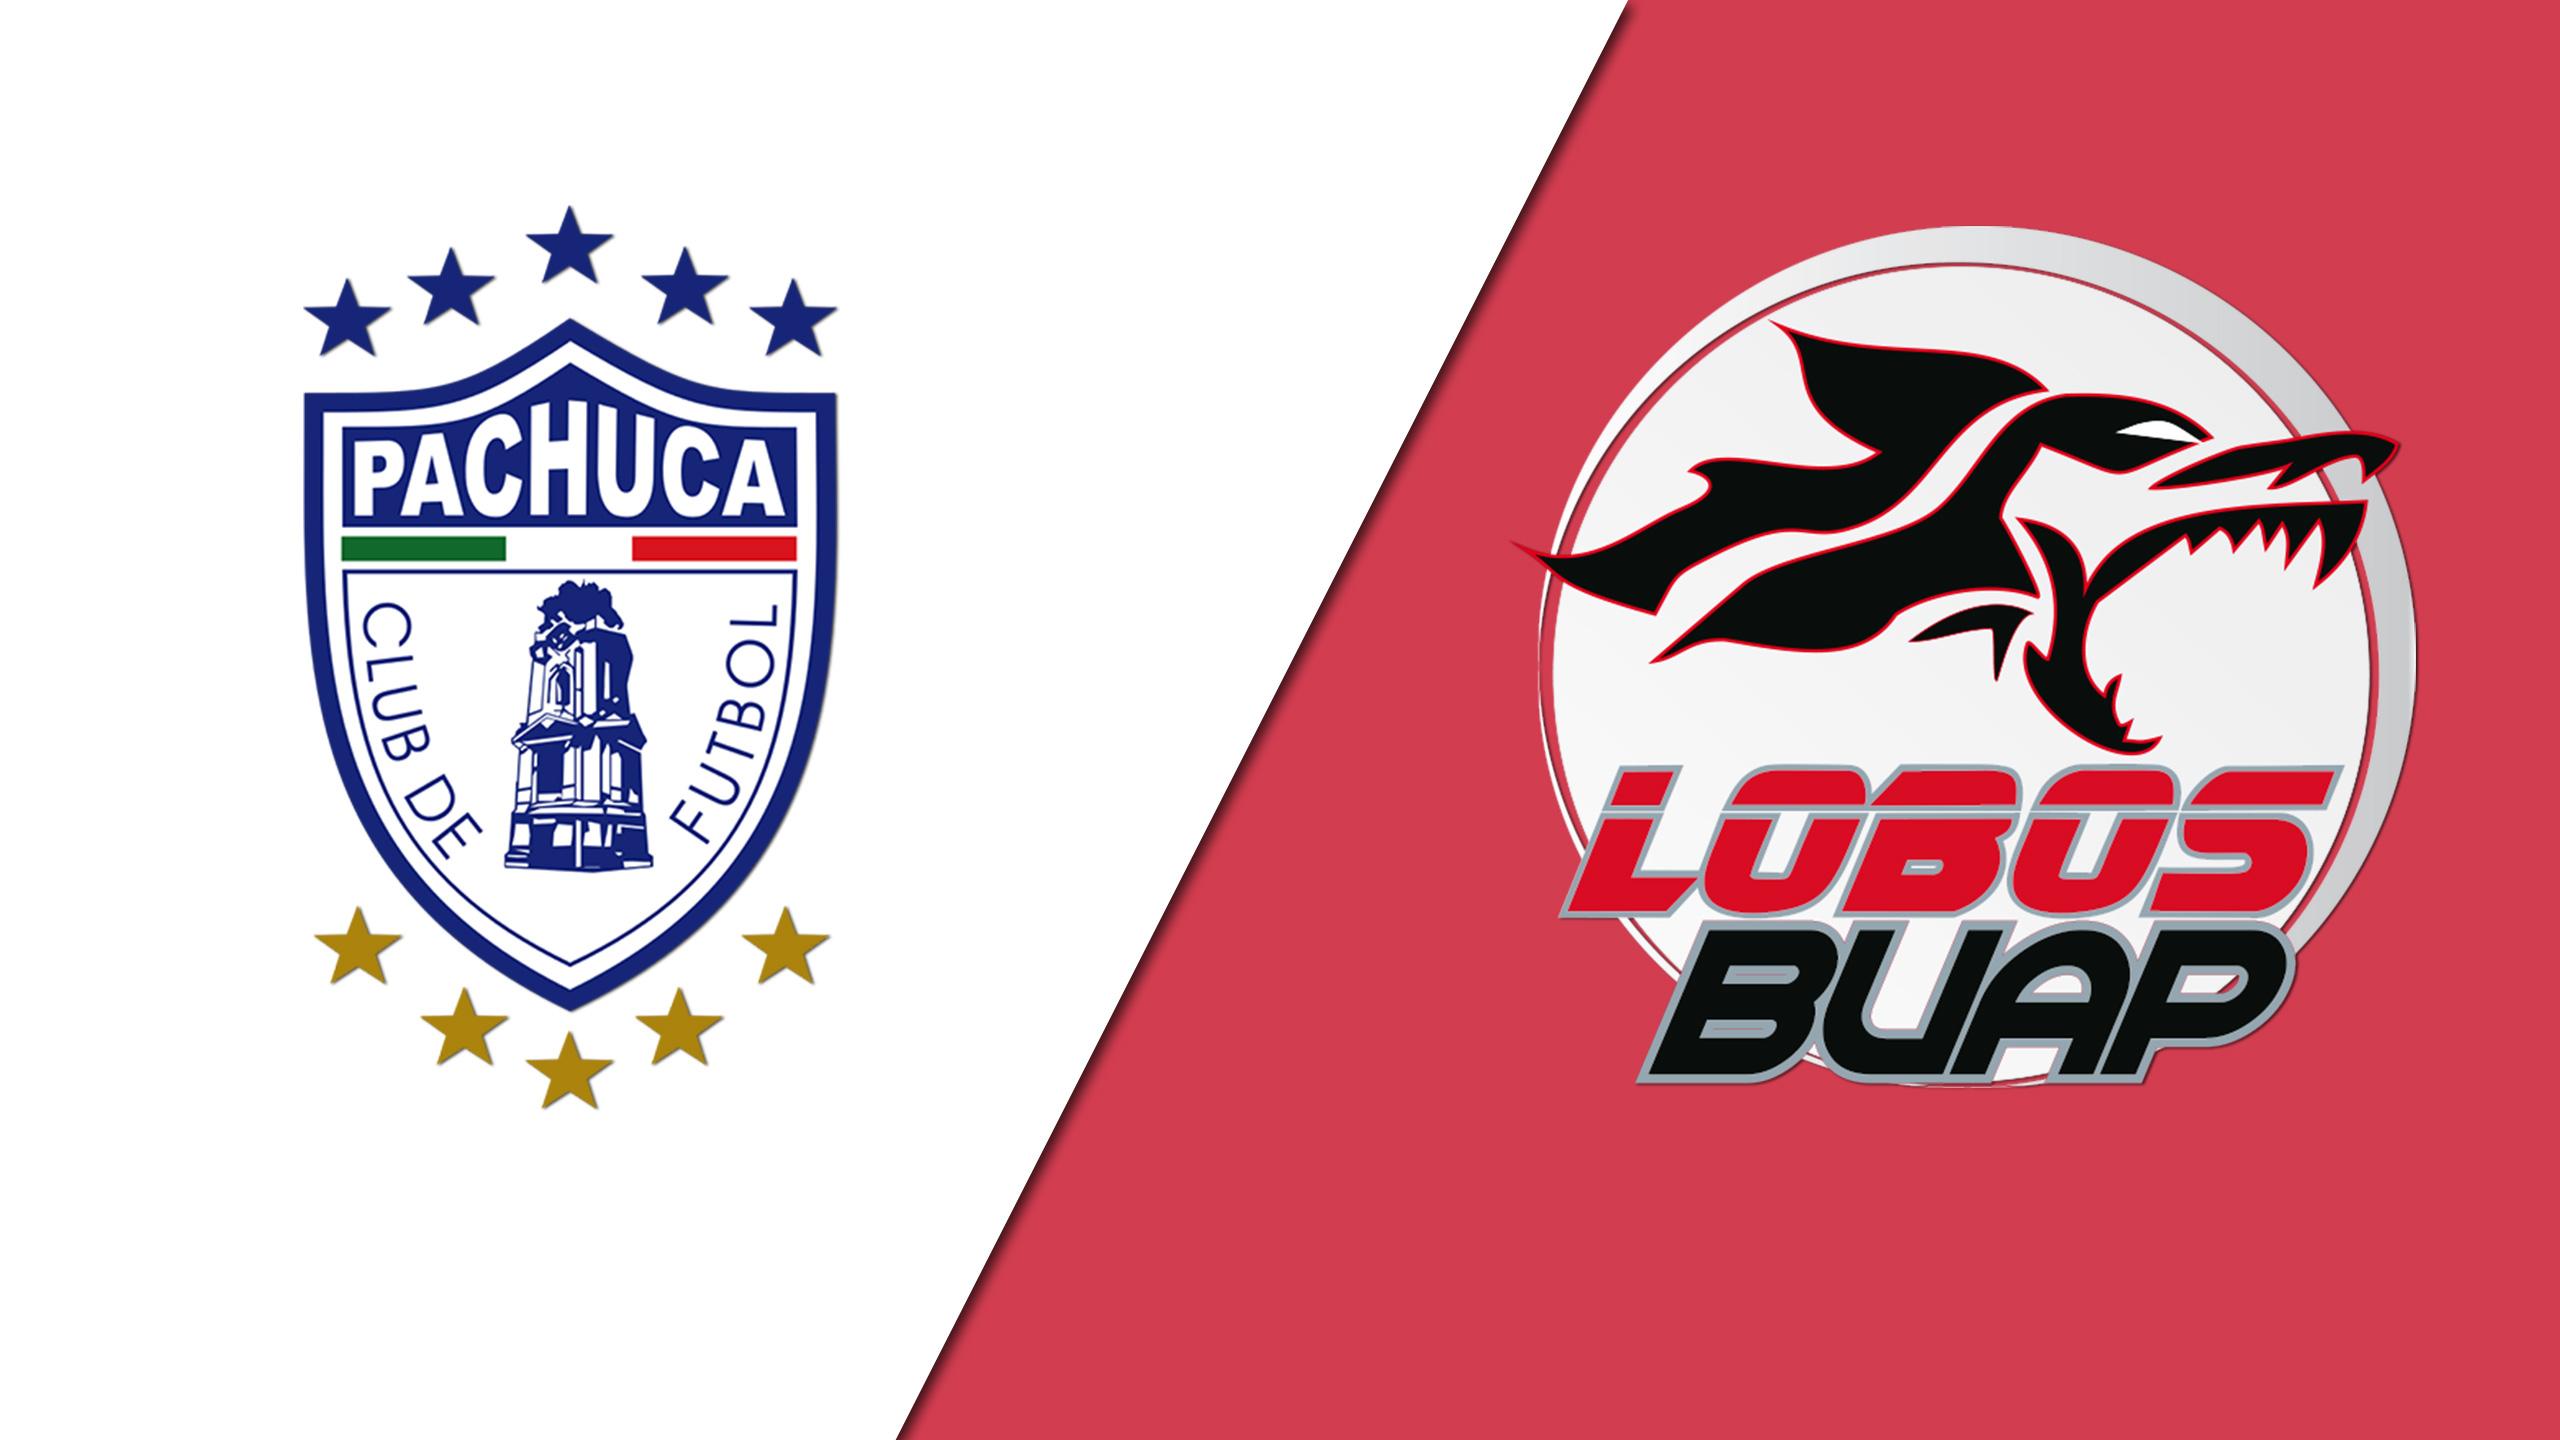 In Spanish - Tuzos del Pachuca vs. Lobos BUAP (Jornada 5) (Liga MX)